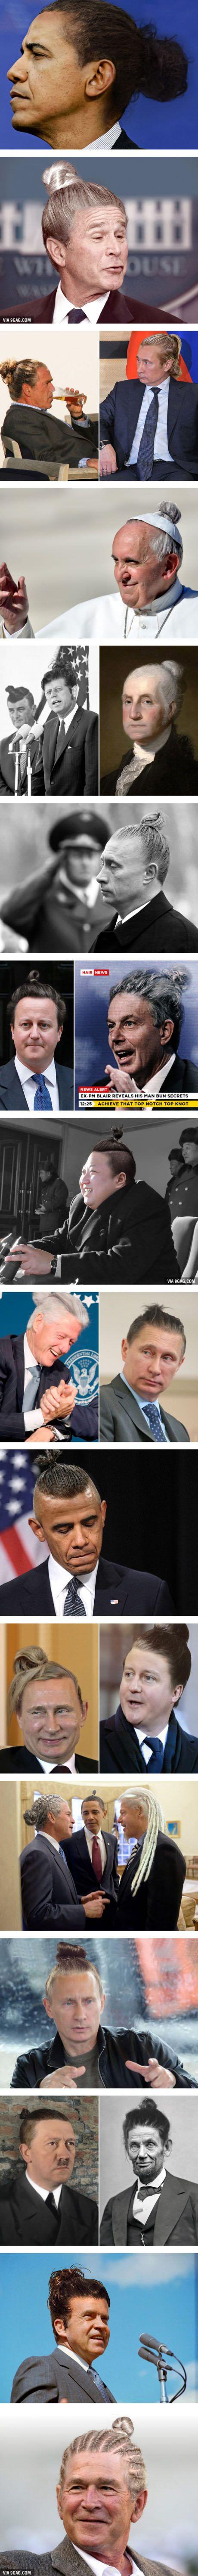 Famous Politicians Reimagined With Man Buns